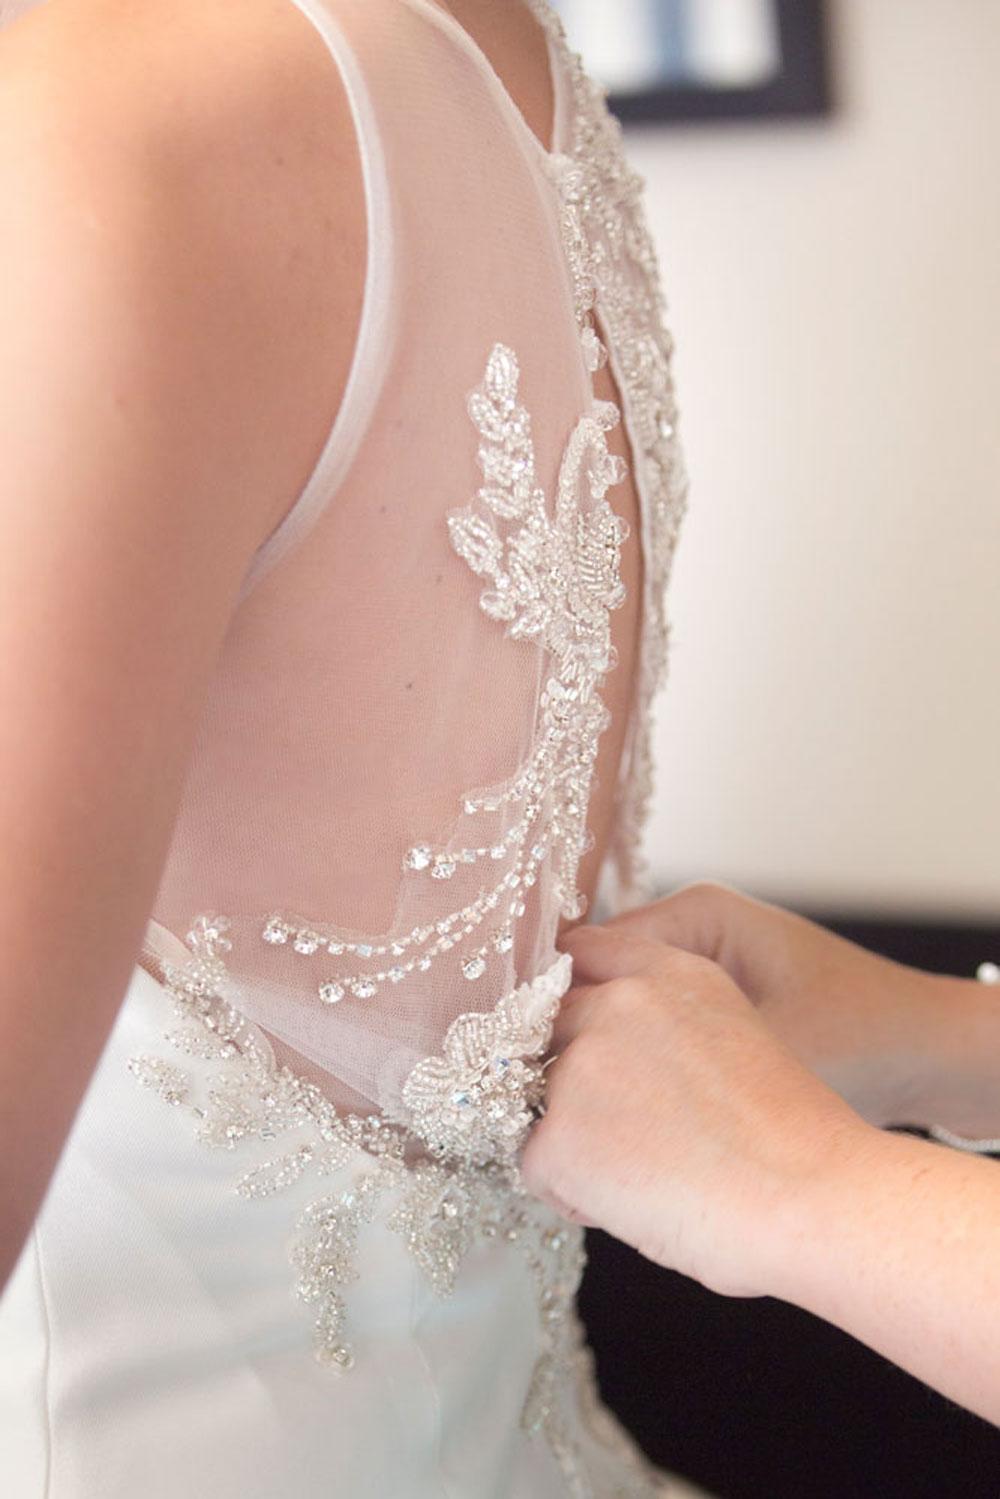 Ardoe House Hotel Wedding, dress close up, Anna Wytrazek Photography, wedding photographer Aberdeen